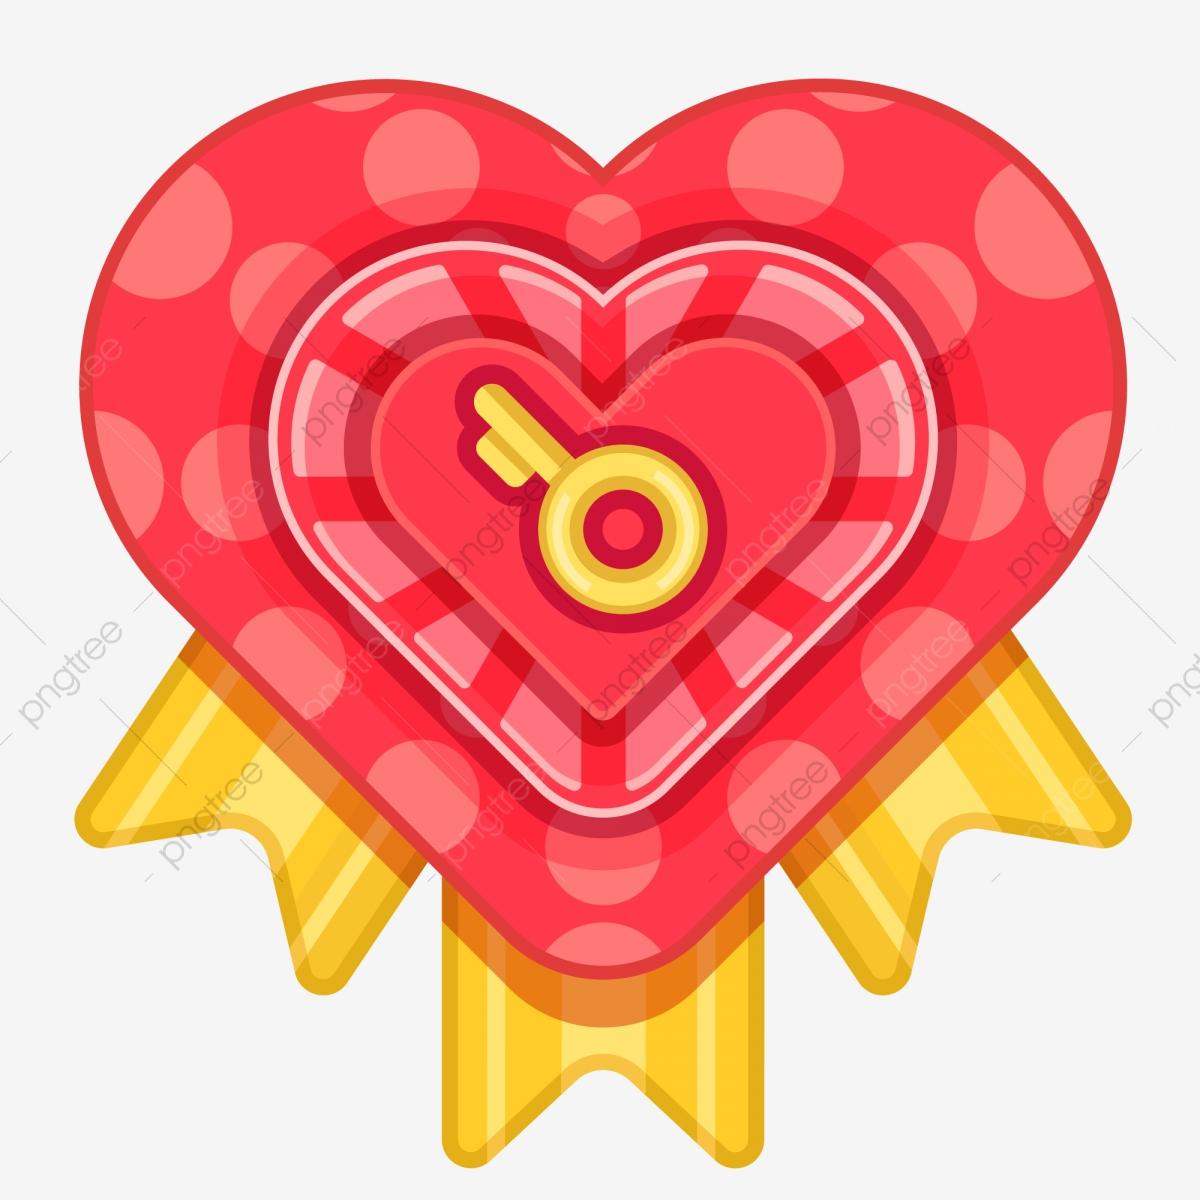 Badge clipart cute. New qiantu network source